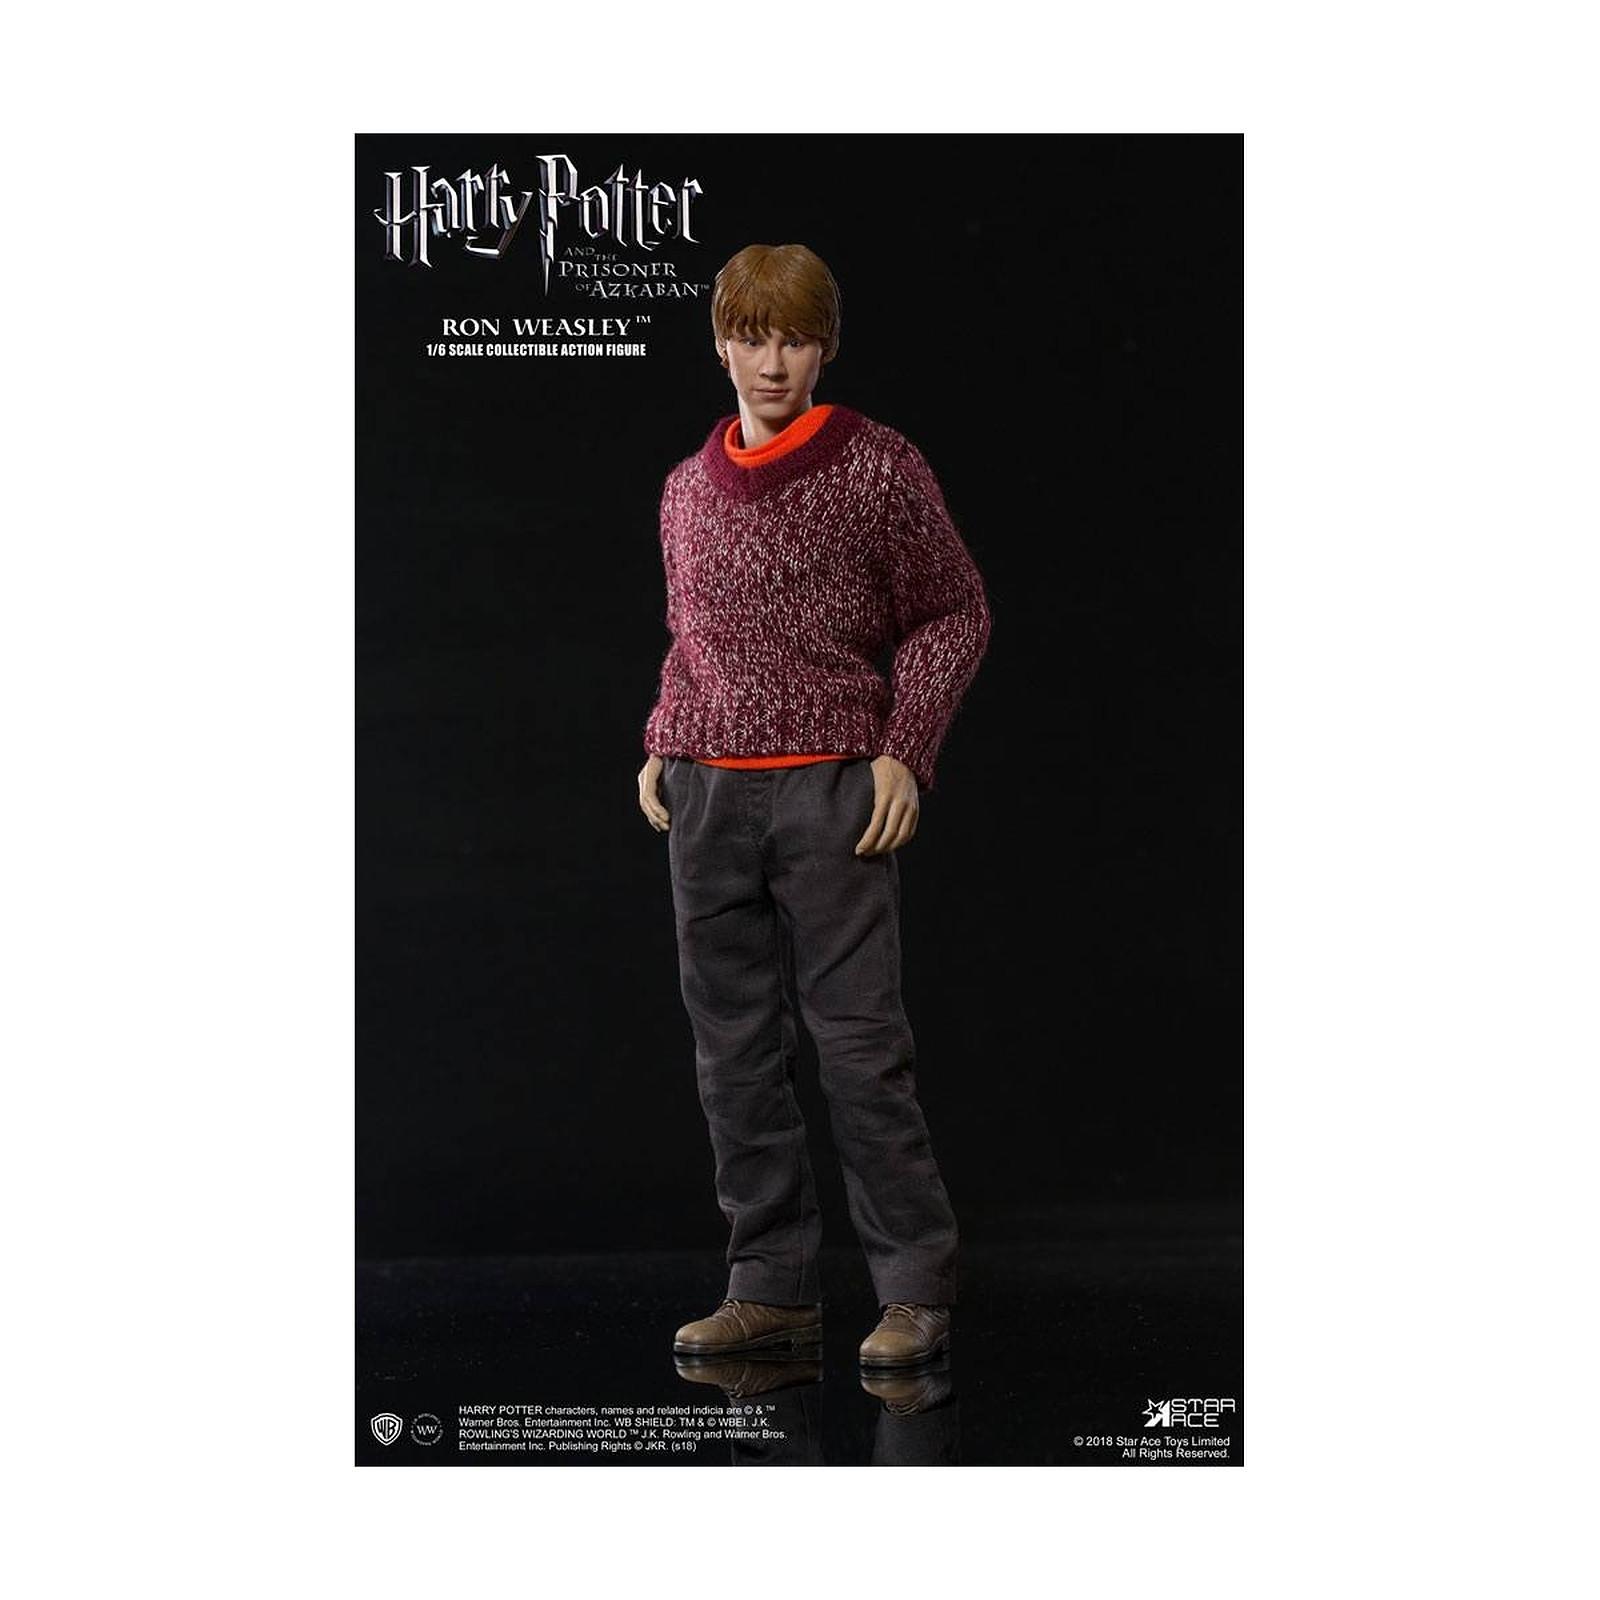 Harry Potter - Figurine 1/6 Ron Weasley Deluxe Ver. 29 cm - My Favourite Movie